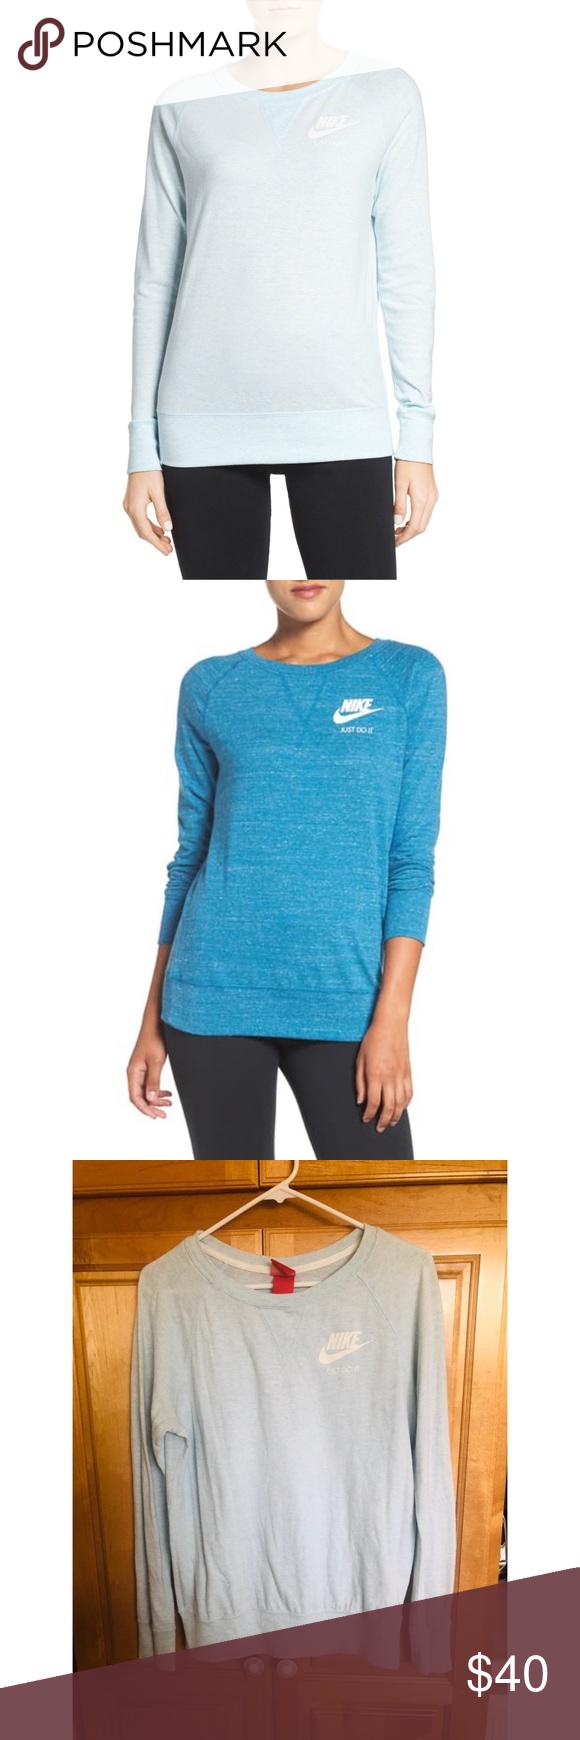 Nike Vintage Gym Crew Neck Sweatshirt Light Blue Clothes Design Vintage Nike Fashion [ 1740 x 580 Pixel ]